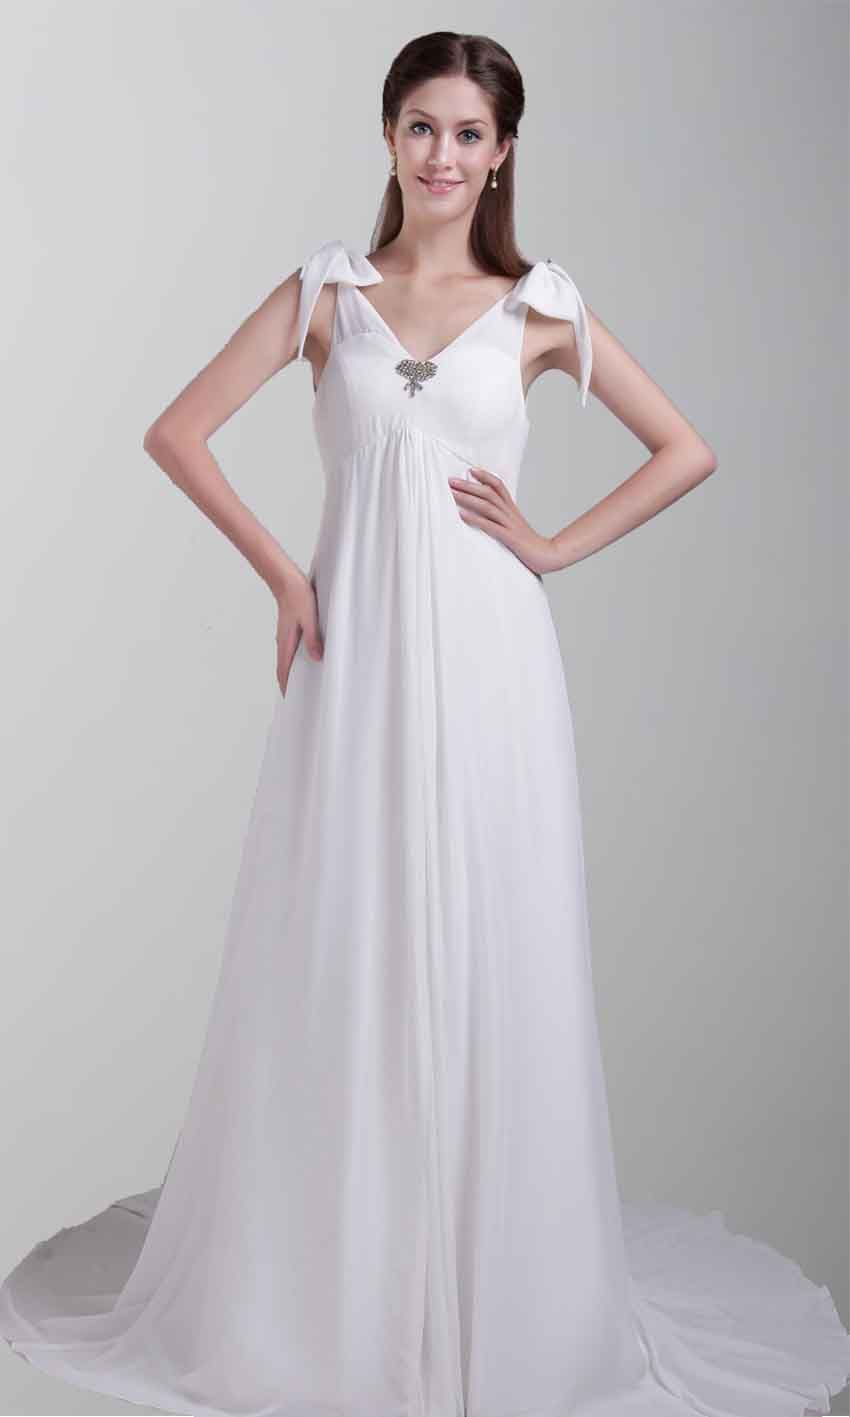 Greek Goddess White Long Prom Dresses With Tie Strap KSP236 | prom ...